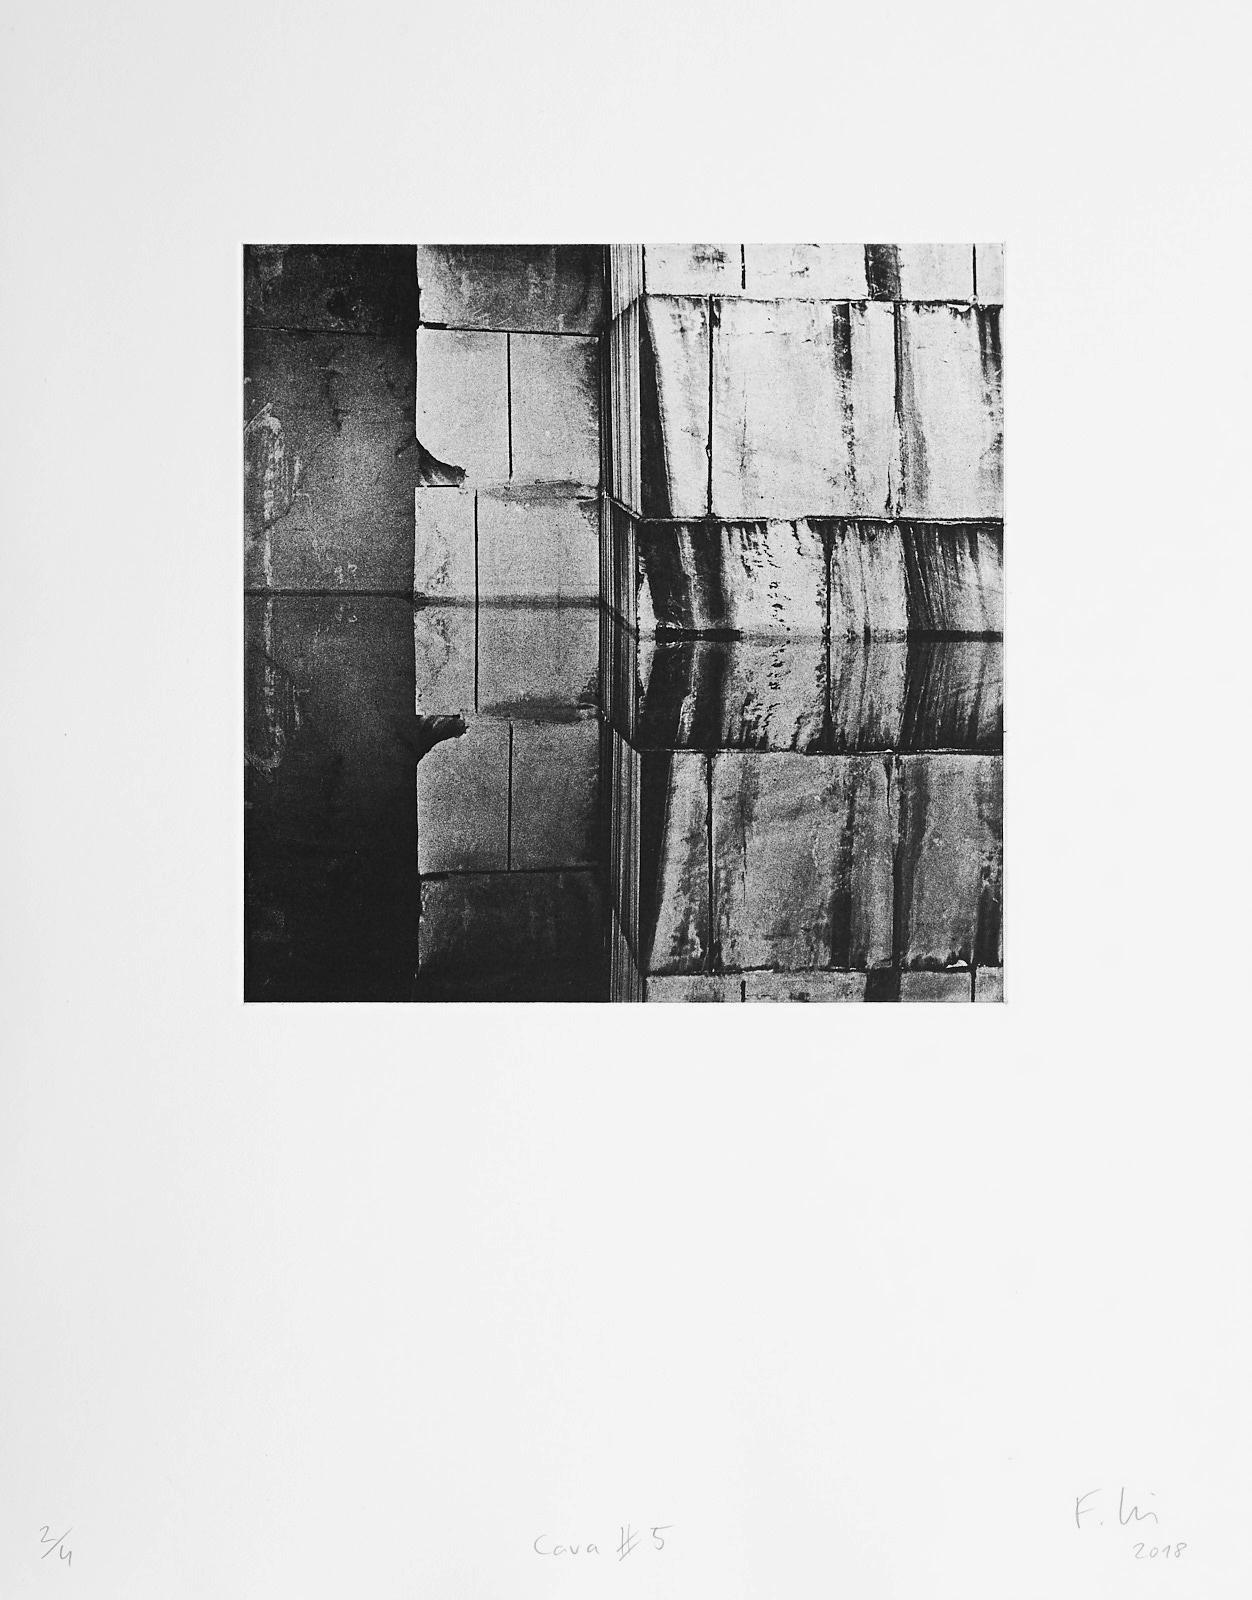 Cava #5 (2018)  medium: Photogravure  size: 36 x 46 cm  paper: Zerkall 270 g/qm  plate: 21.5 x 21.5 cm  edition: 7 copies  numbered: 1/4 - 4/4, 3 e.a.  printer: FWU